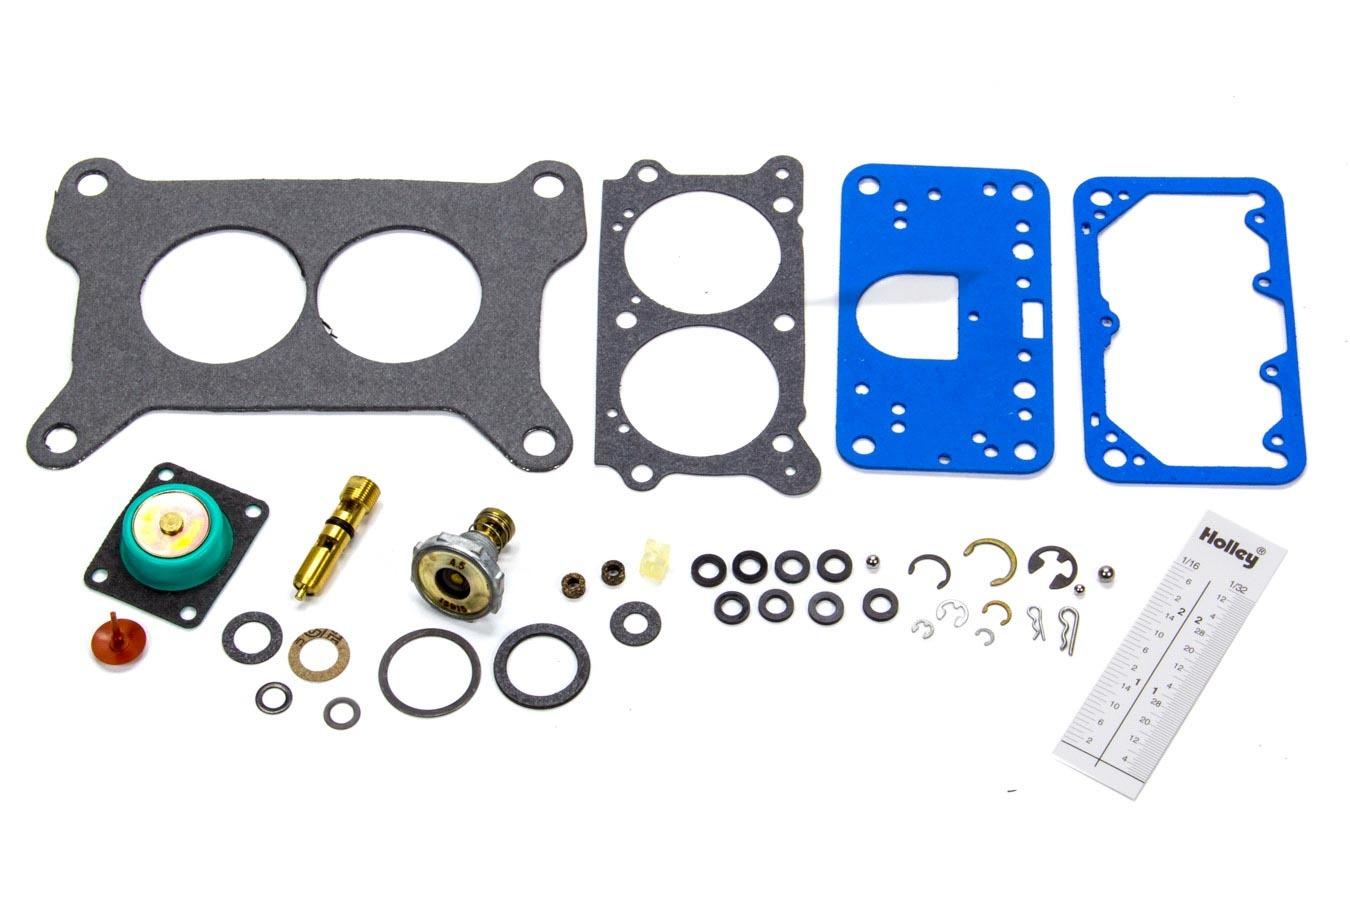 Holley 703-45 Marine Carburetor Rebuild Kit